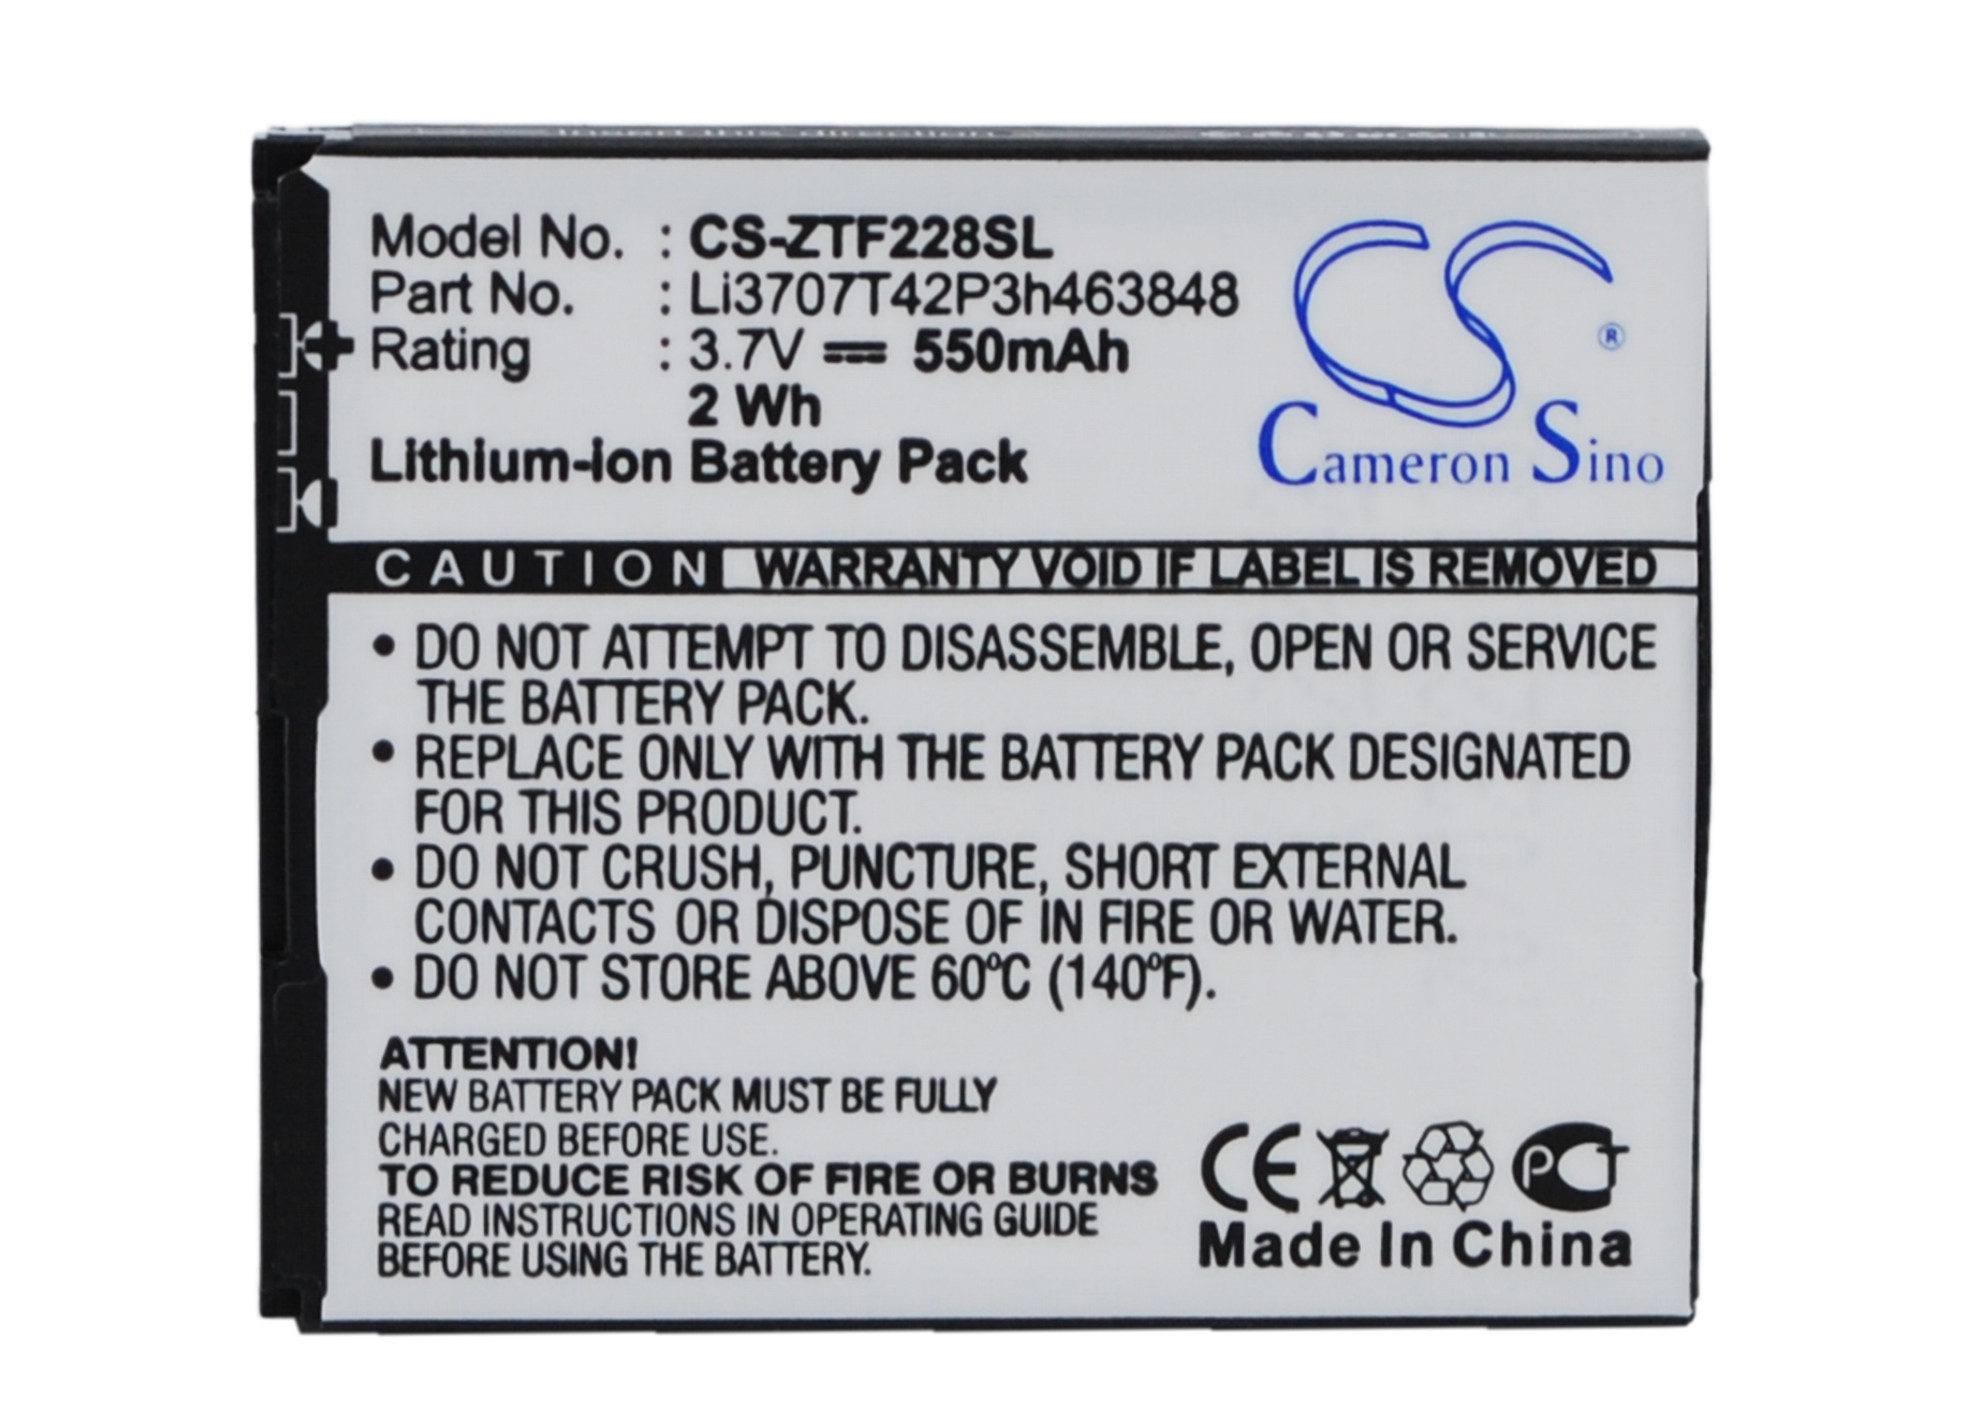 Cameron Sino baterie do mobilů pro VODAFONE VF228 3.7V Li-ion 550mAh černá - neoriginální